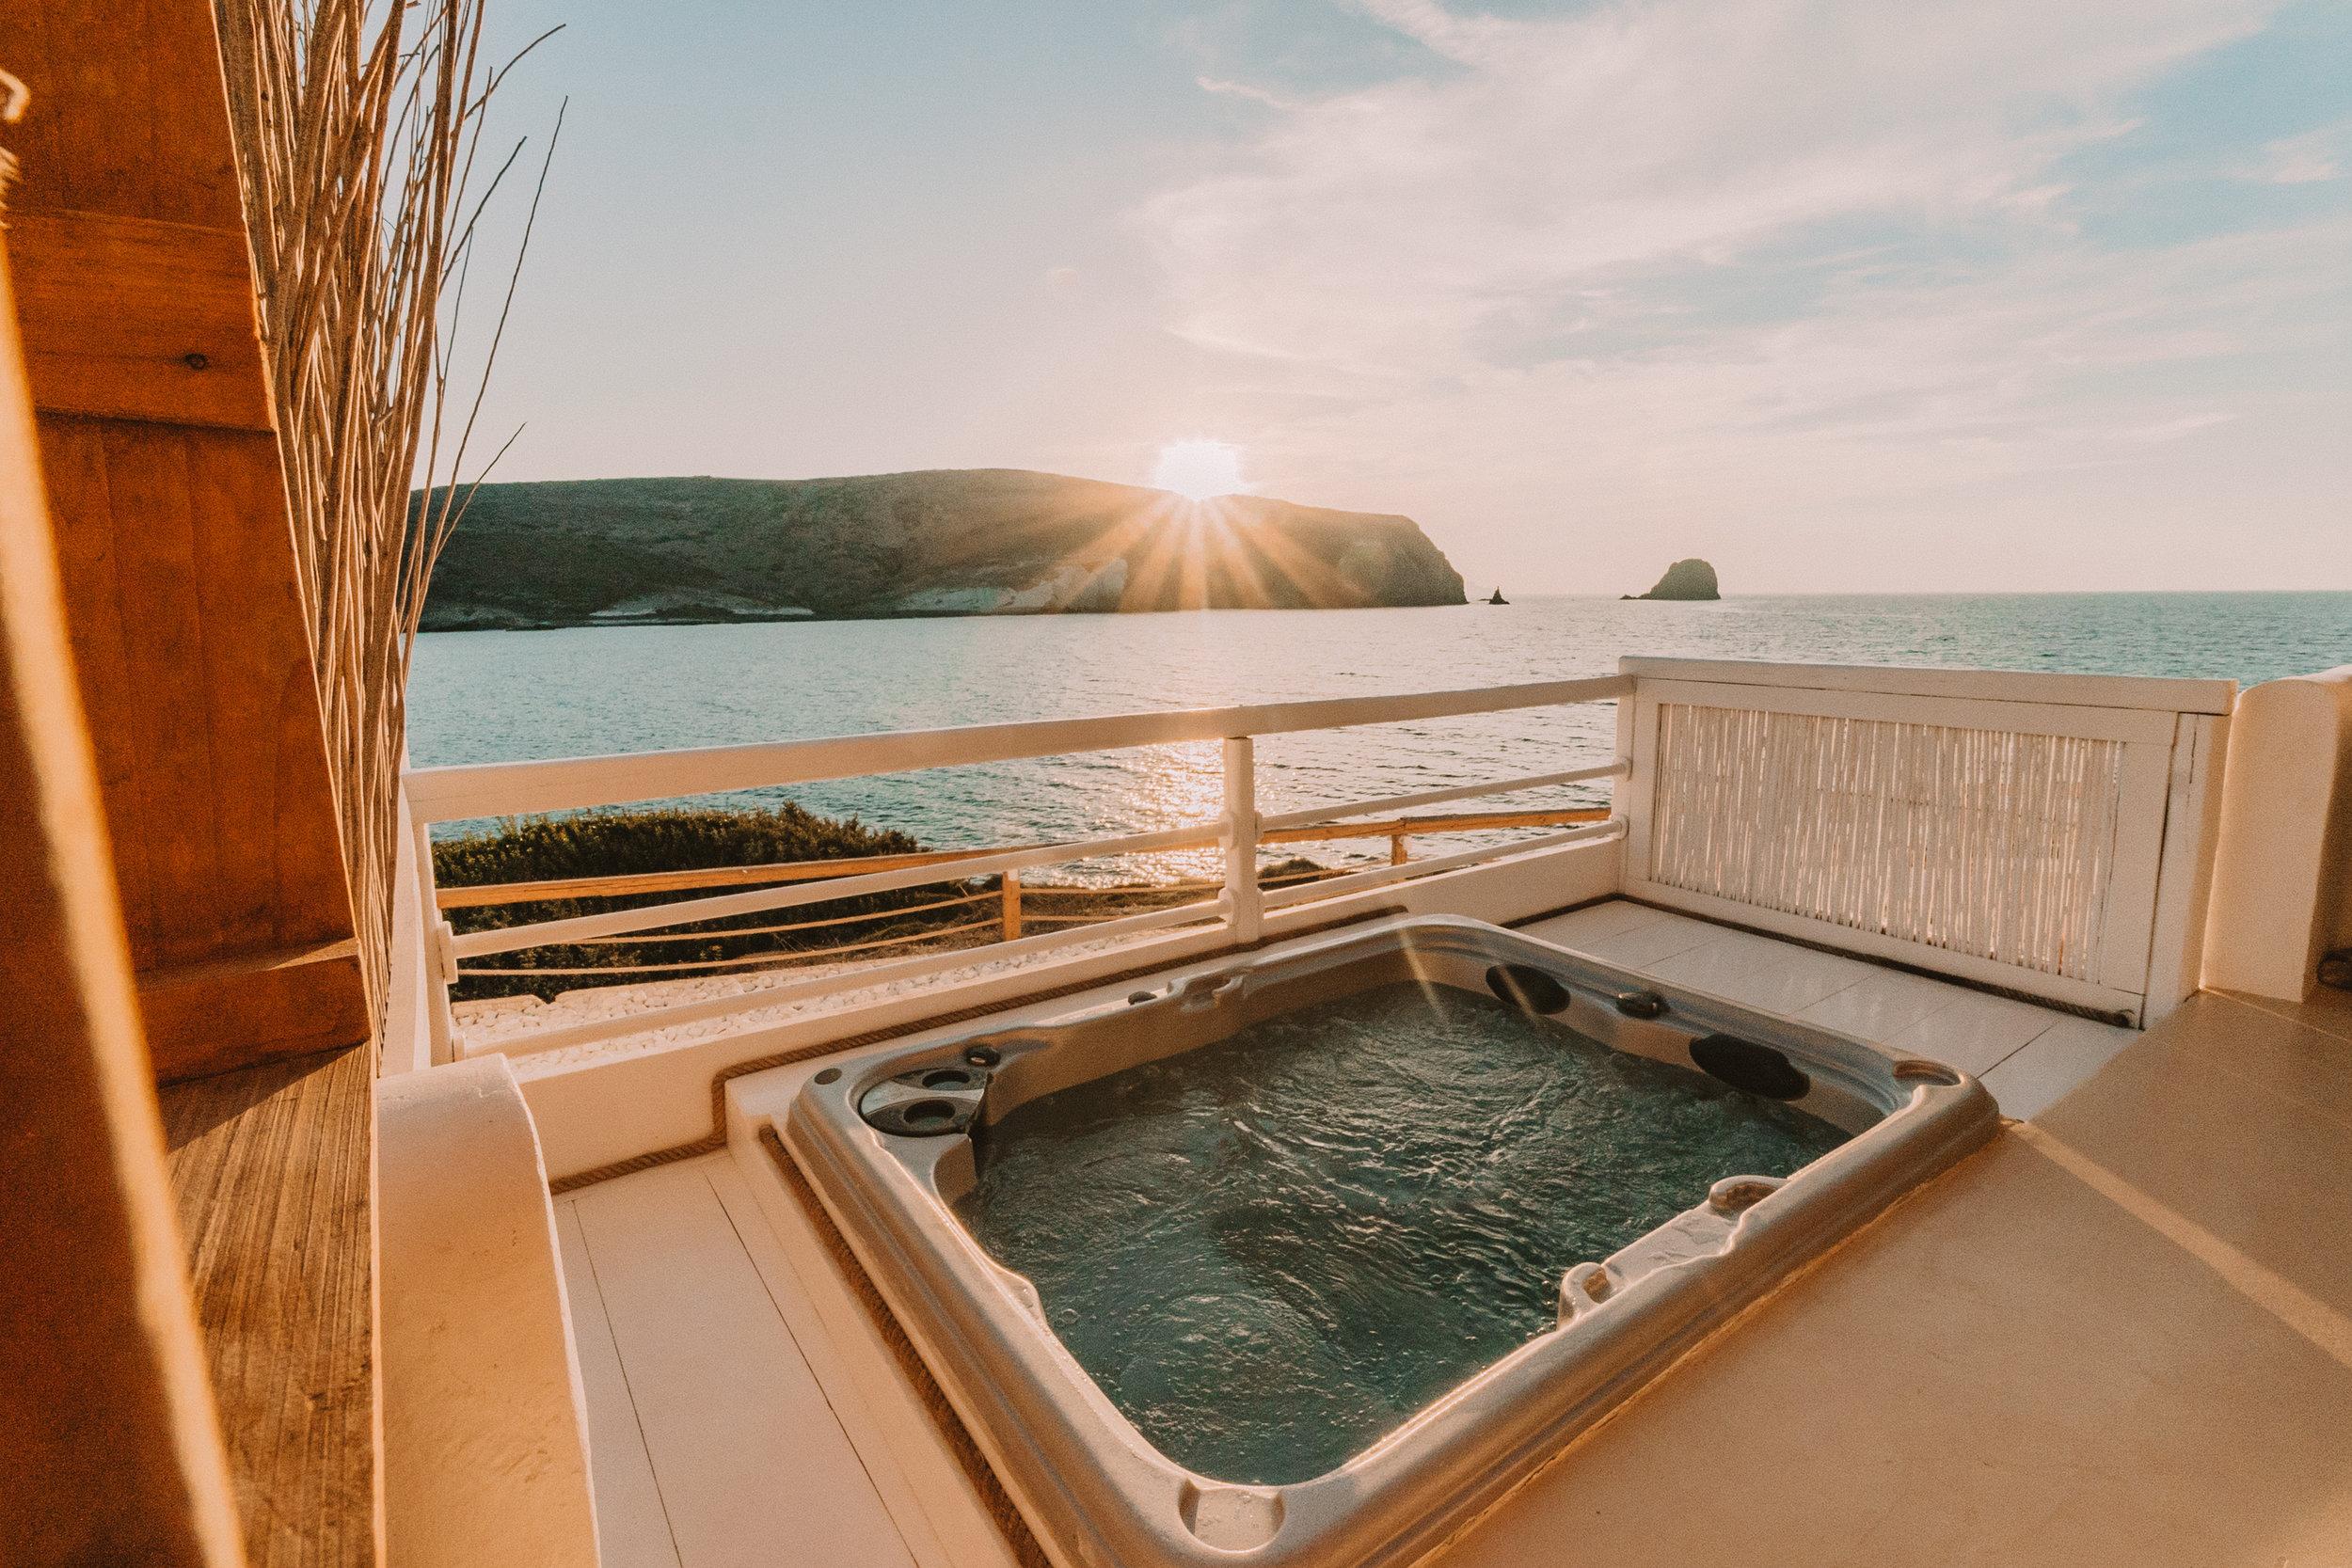 Salt Milos Outdoor Hot Tub - illumelation